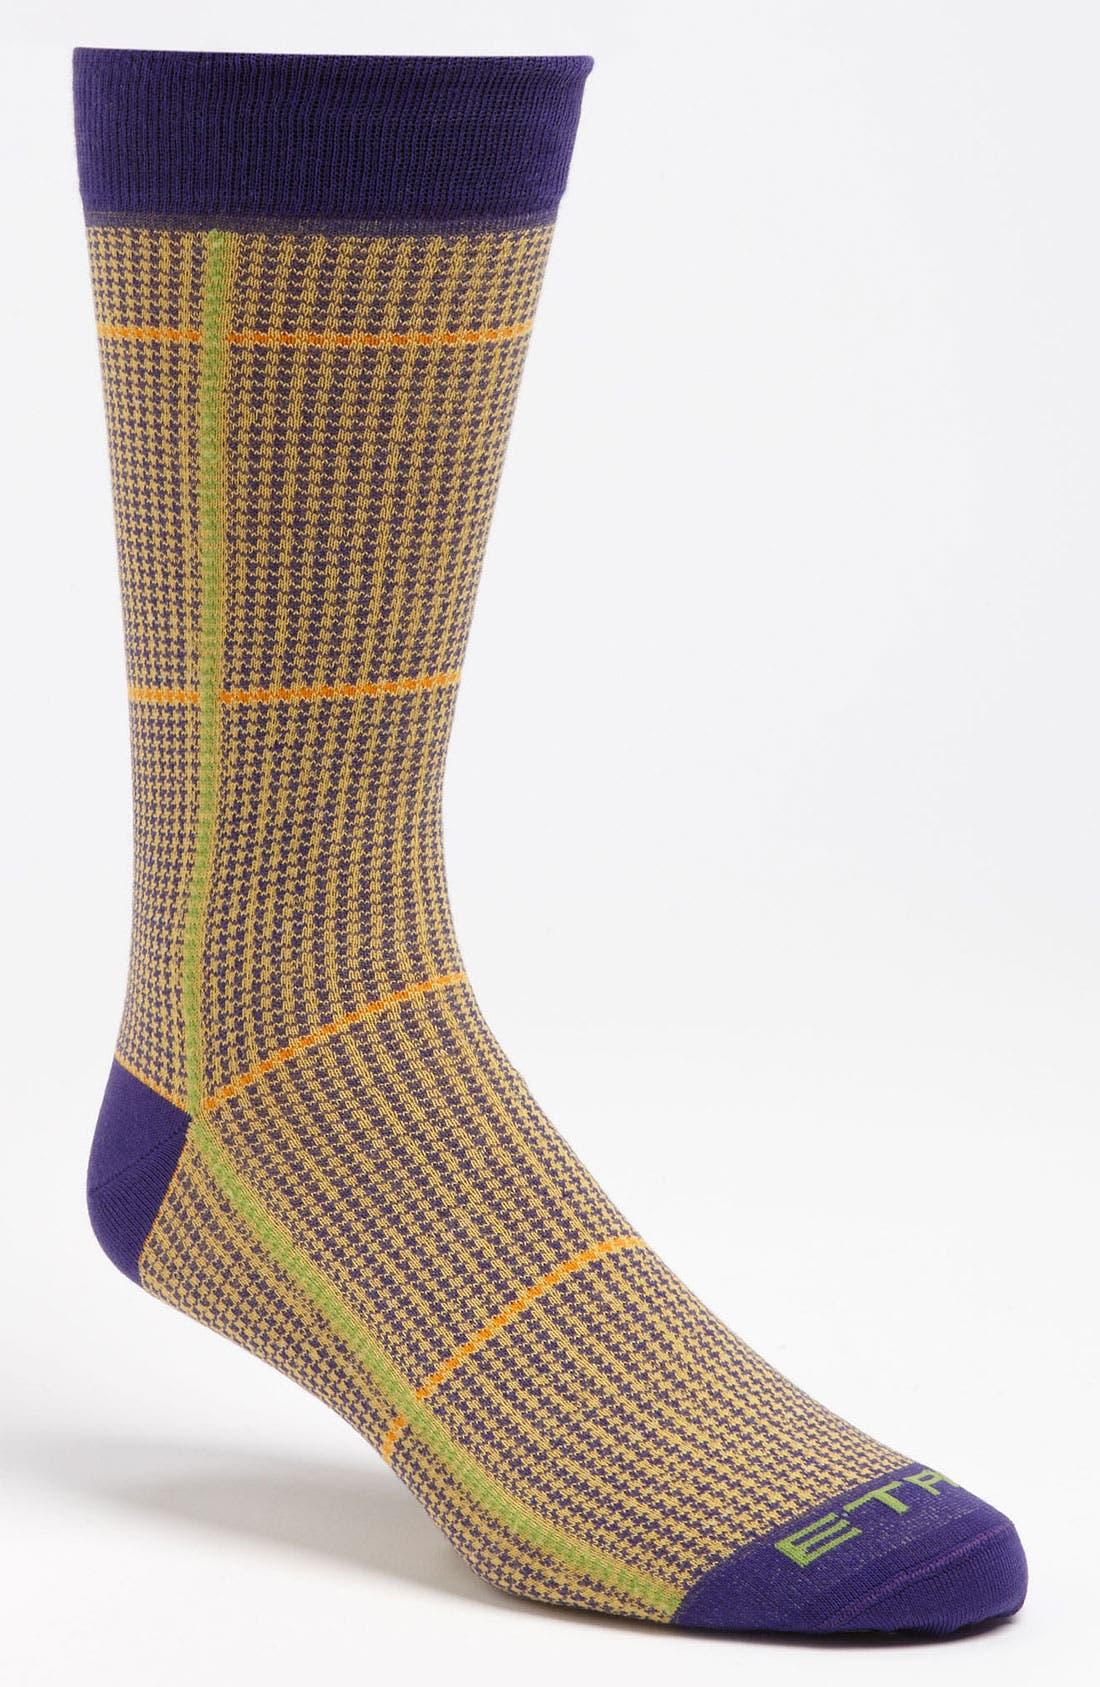 Alternate Image 1 Selected - Etro Houndstooth Cotton Blend Socks